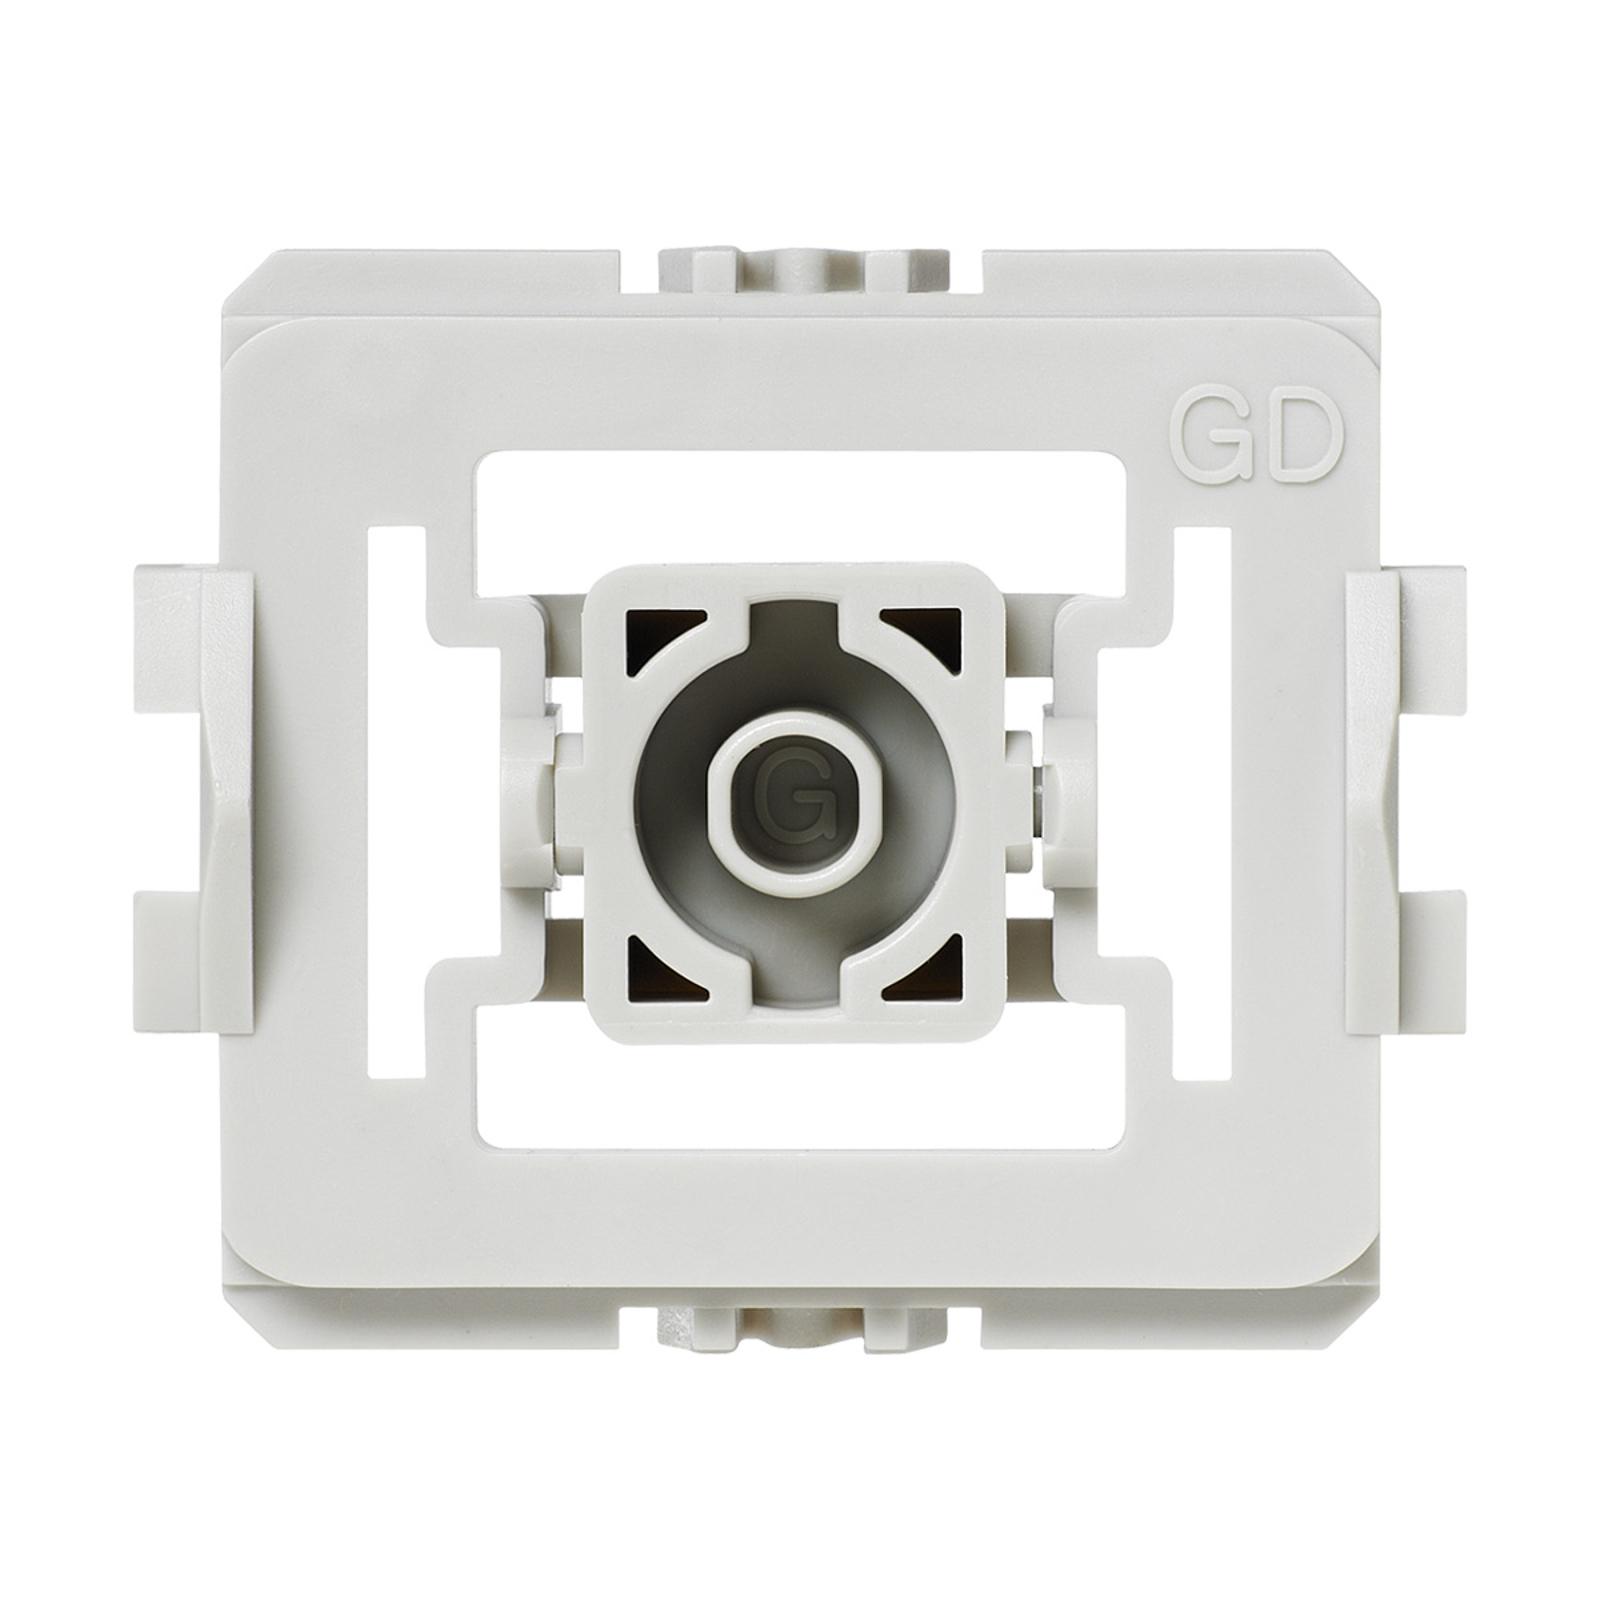 Homematic IP adaptateur pour Gira standard 20x